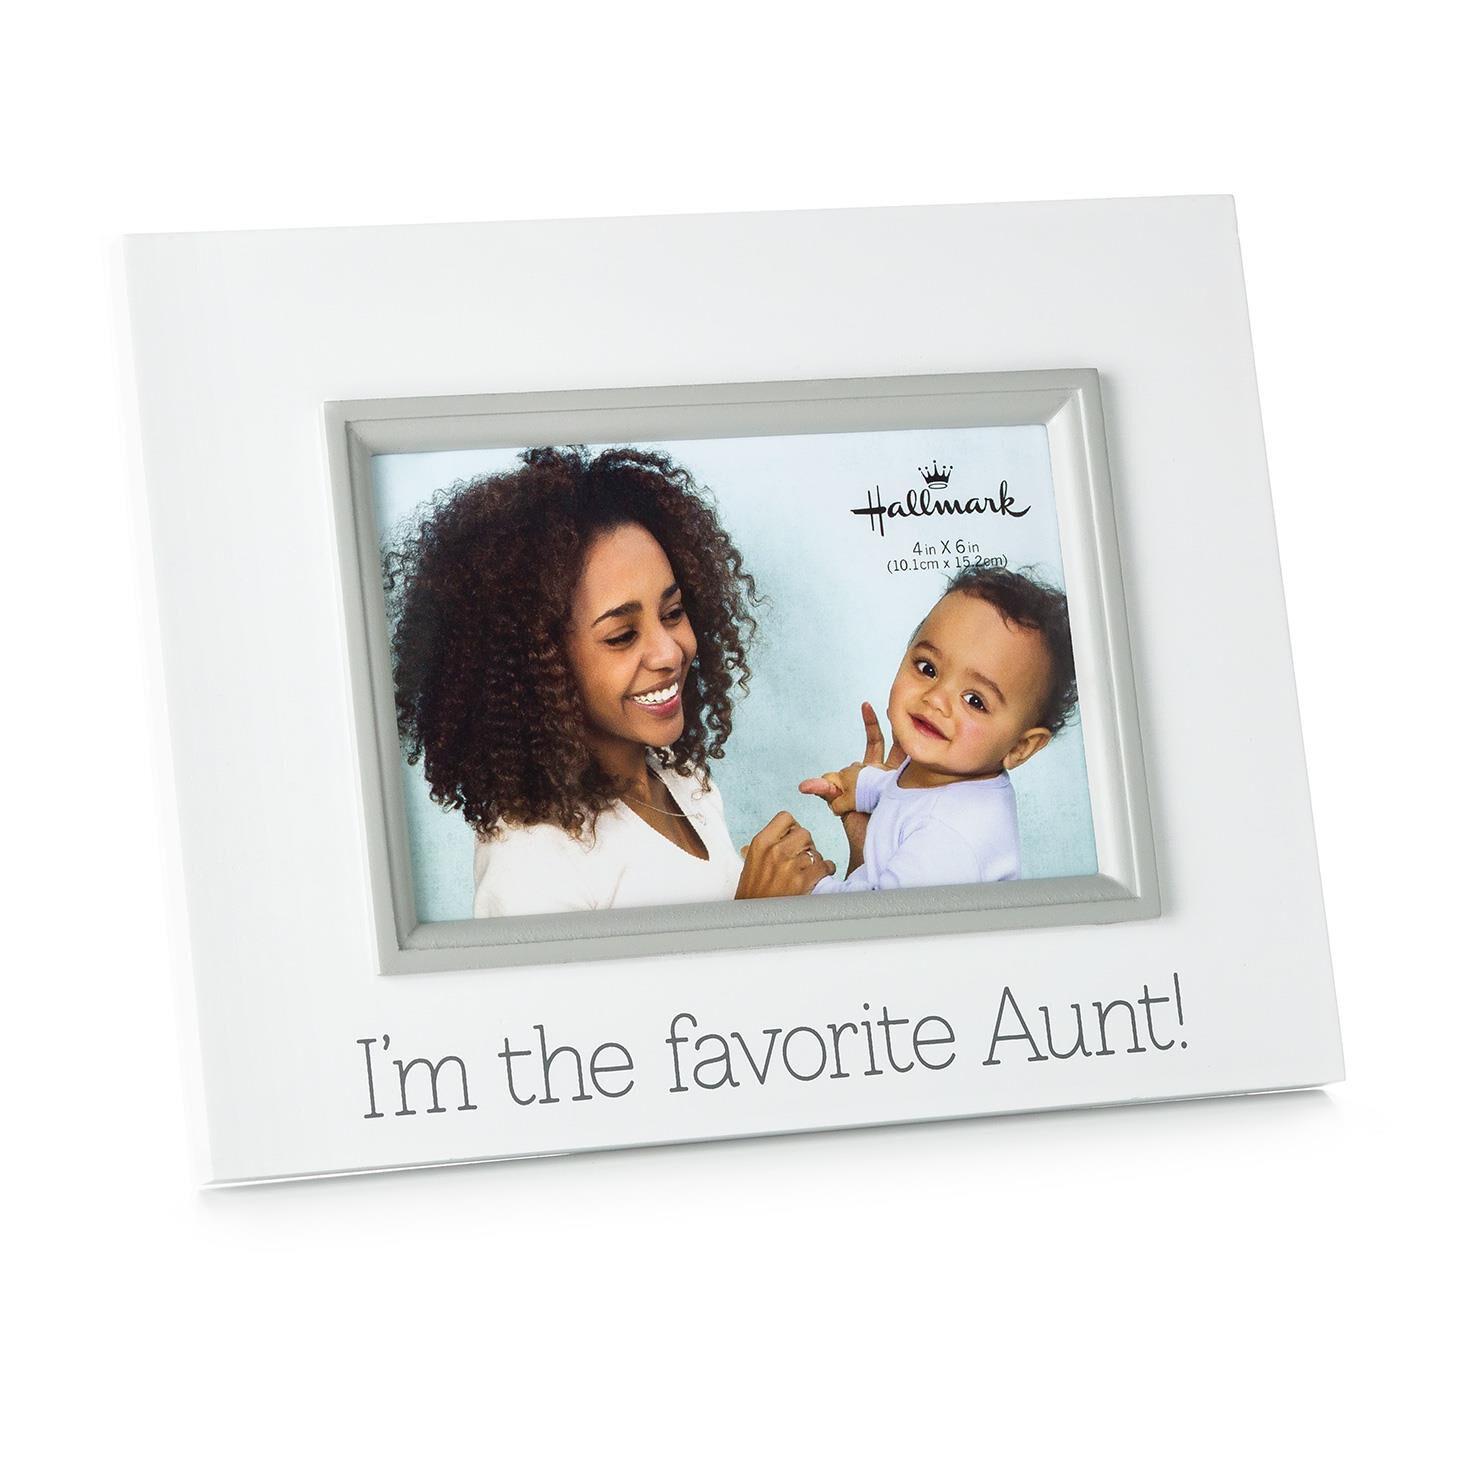 favorite aunt wood malden picture frame 4x6 picture frames hallmark